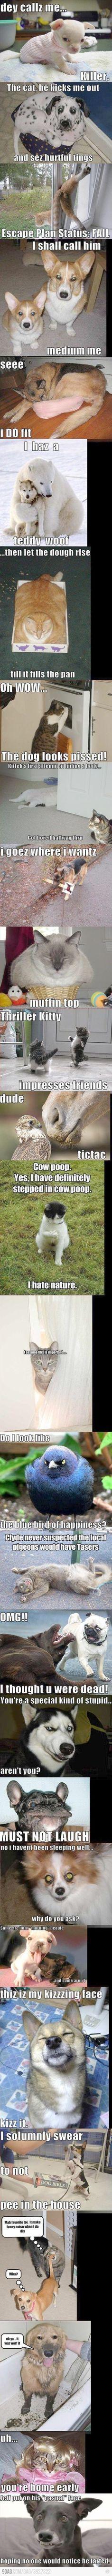 Impressive -> Cute Animals Memes xxx